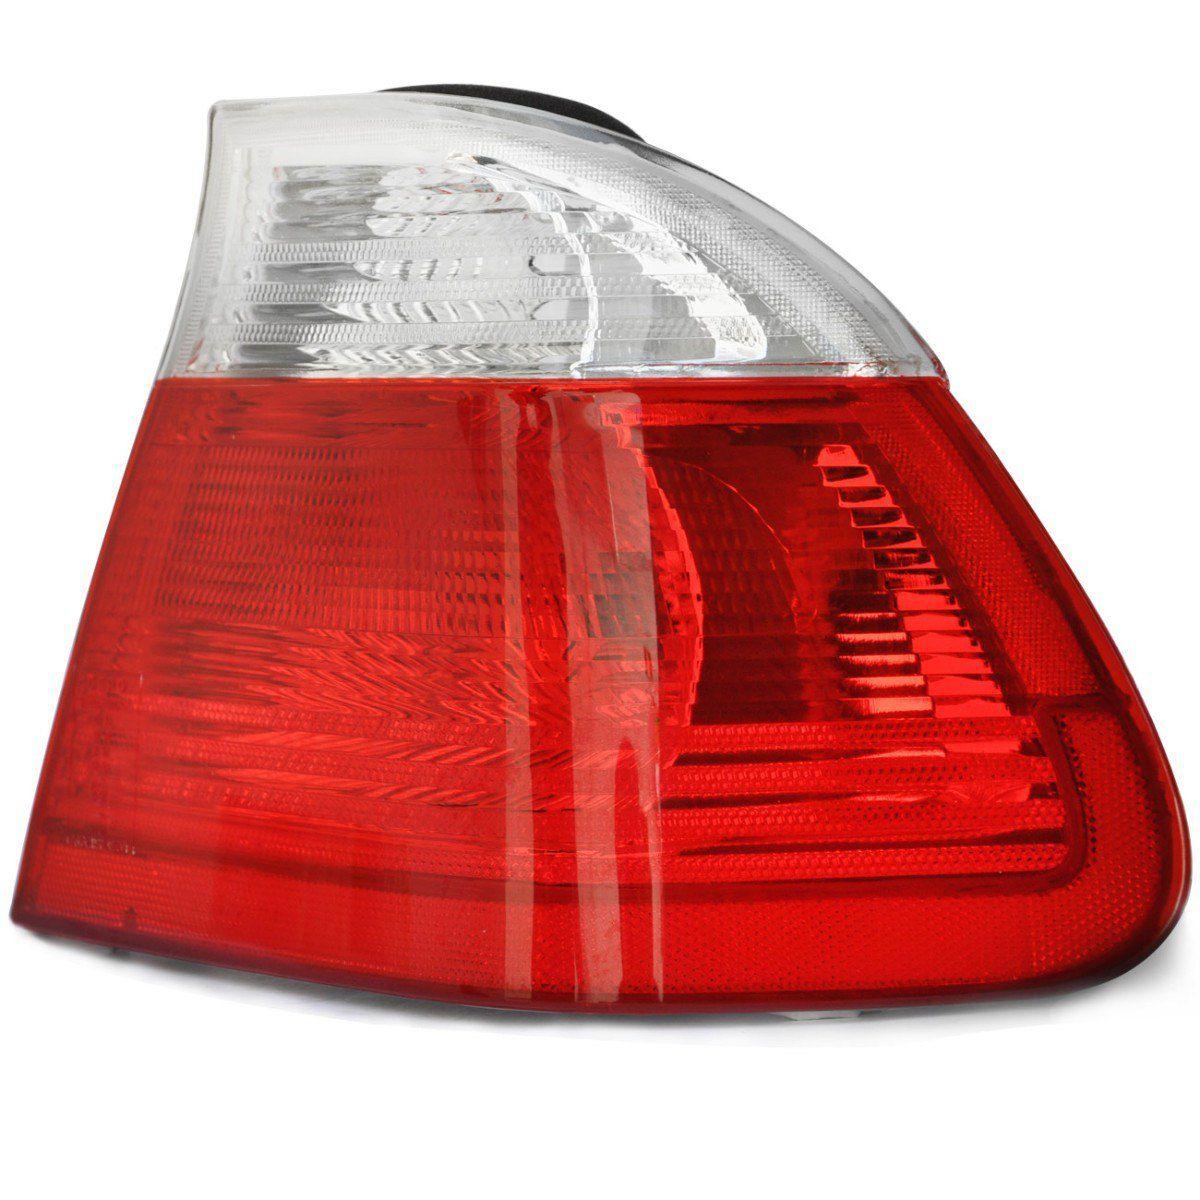 Lanterna Traseira Bmw S3 1998 99 00 01 02 03 Cristal